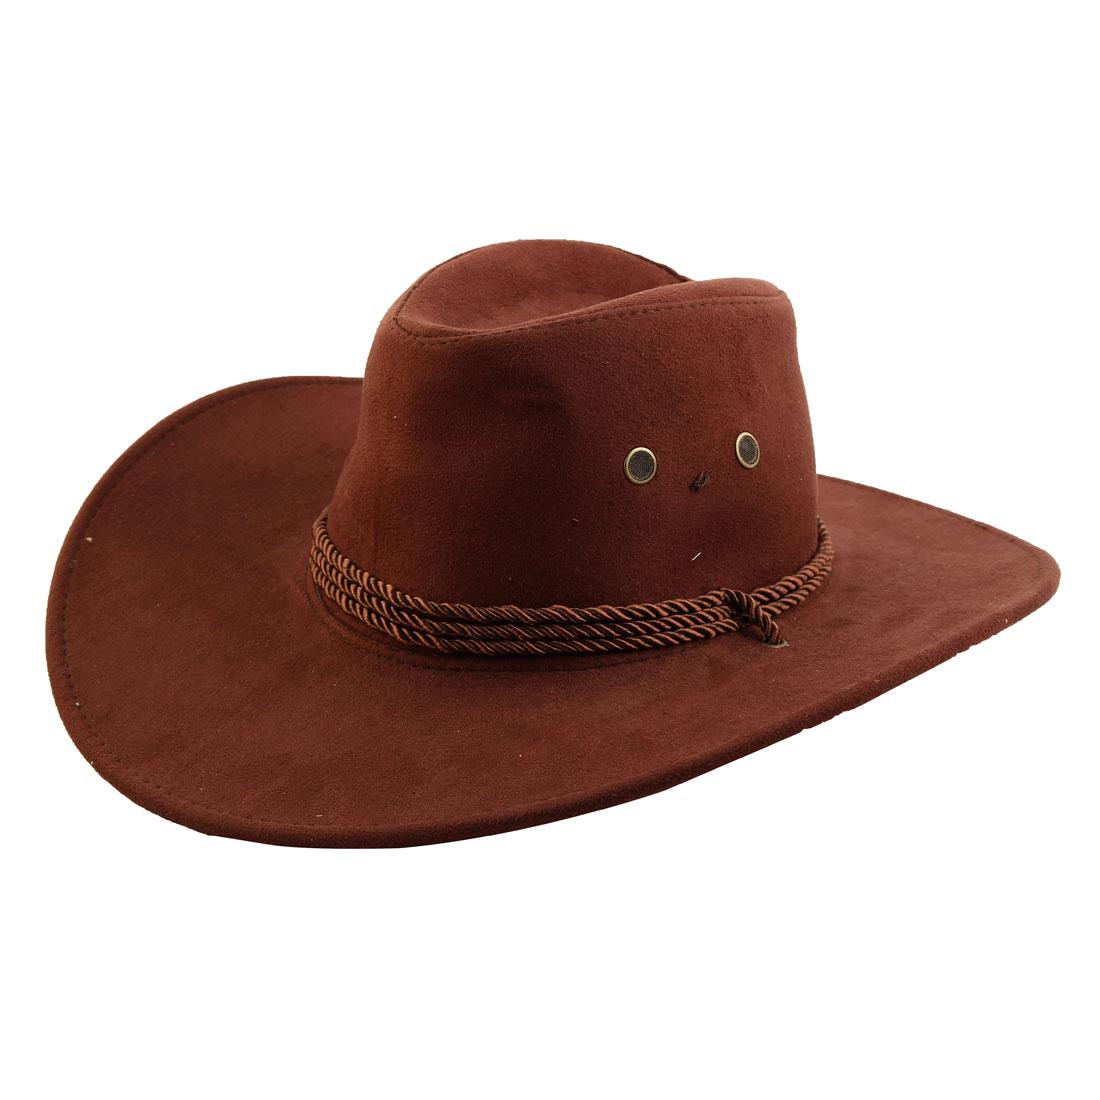 Faux Suede Adjustable Neck Strap Western Style Sunhat Cowboy Hat Dark Brown